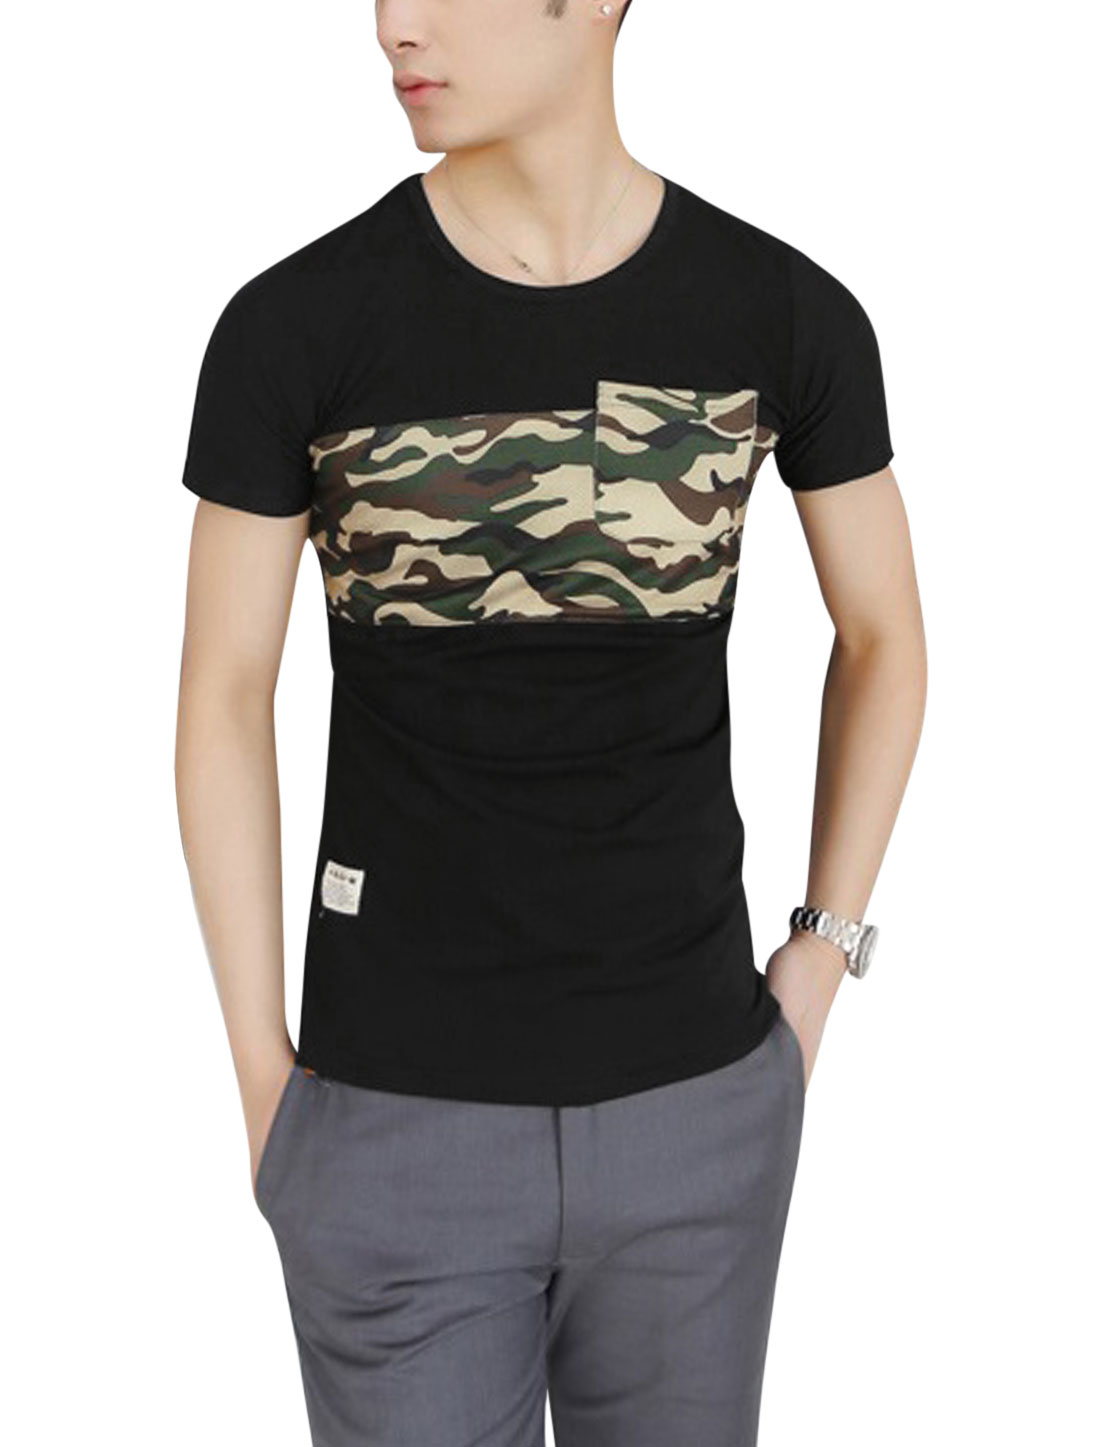 Men Short Sleeve Camouflage Prints Panel Design Tee Black S